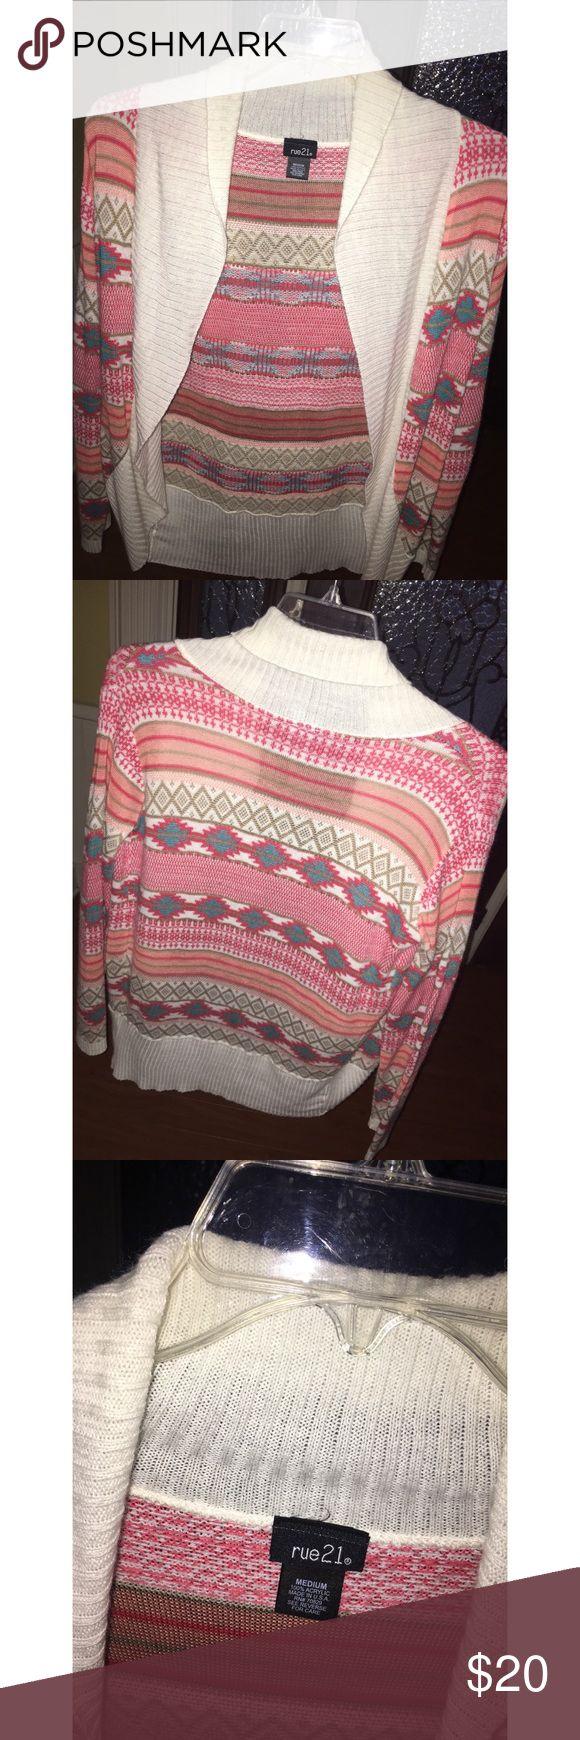 Rue 21 Cream/Multi-Colored Cardigan Great condition! Size Medium Rue 21 Sweaters Cardigans